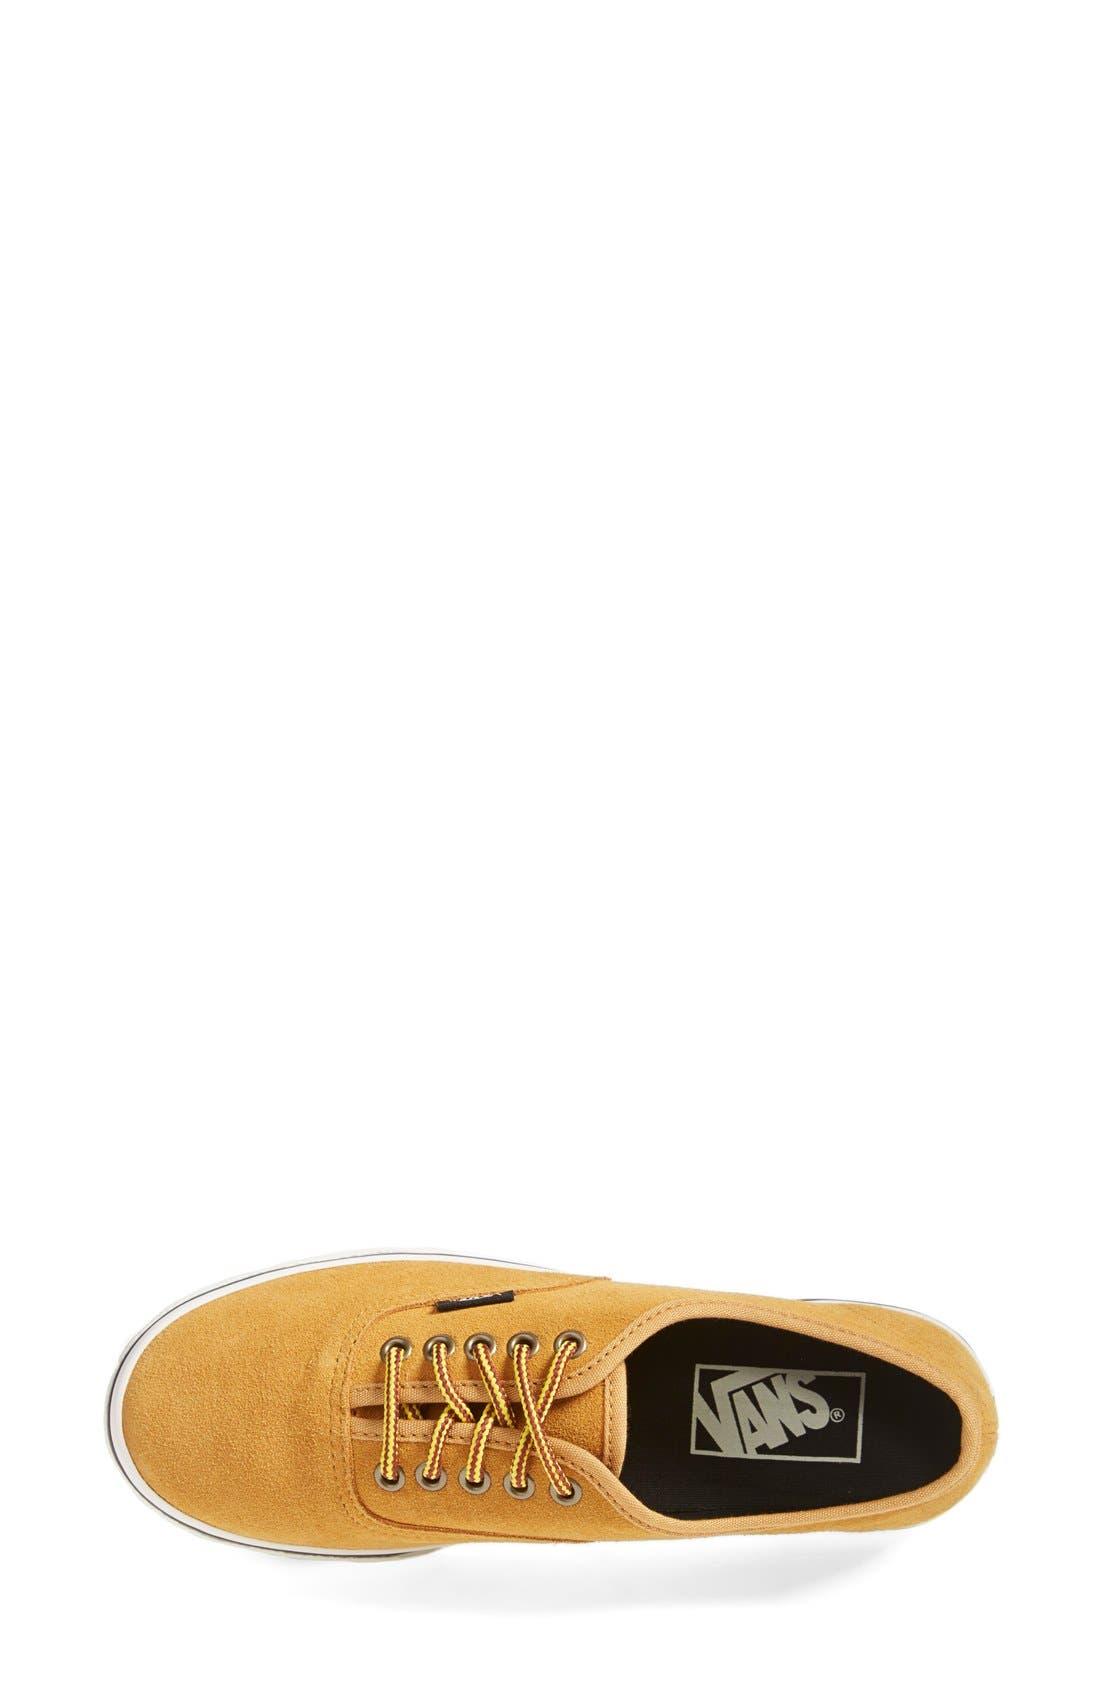 Alternate Image 3  - Vans 'Authentic - Lo Pro' Suede Sneaker (Women)